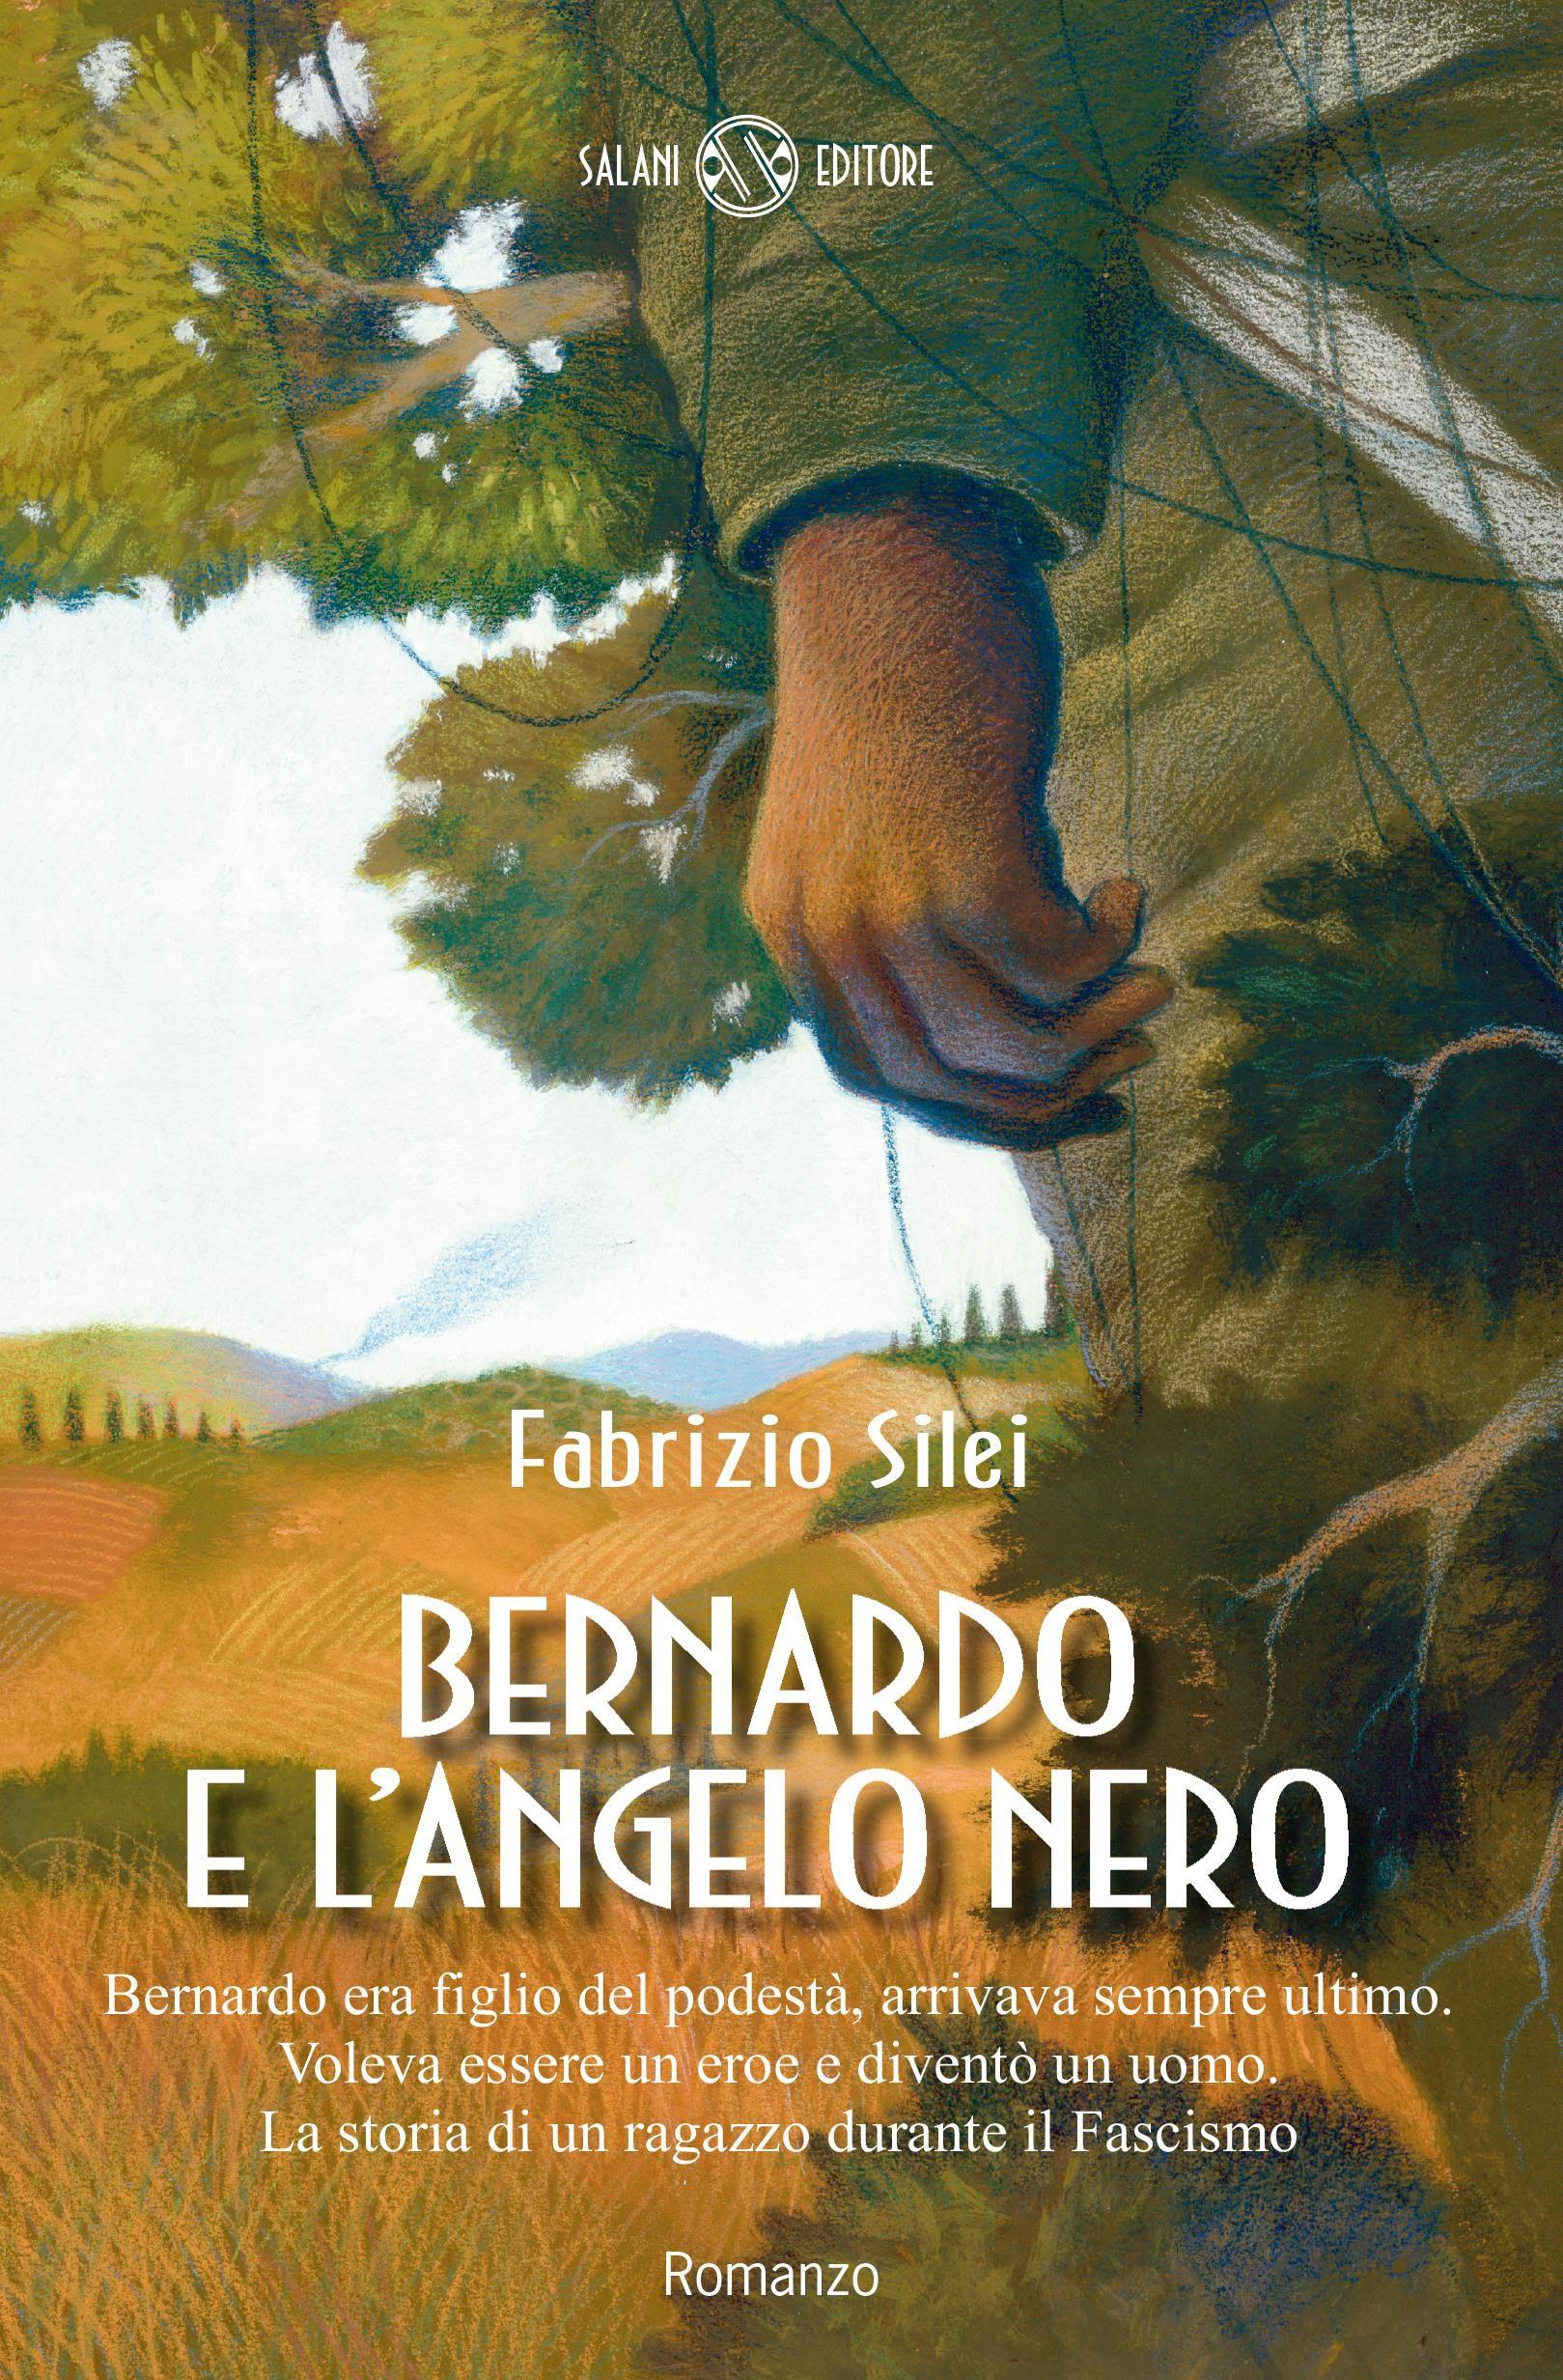 Bernardo e l'angelo nero - edizioni Salani